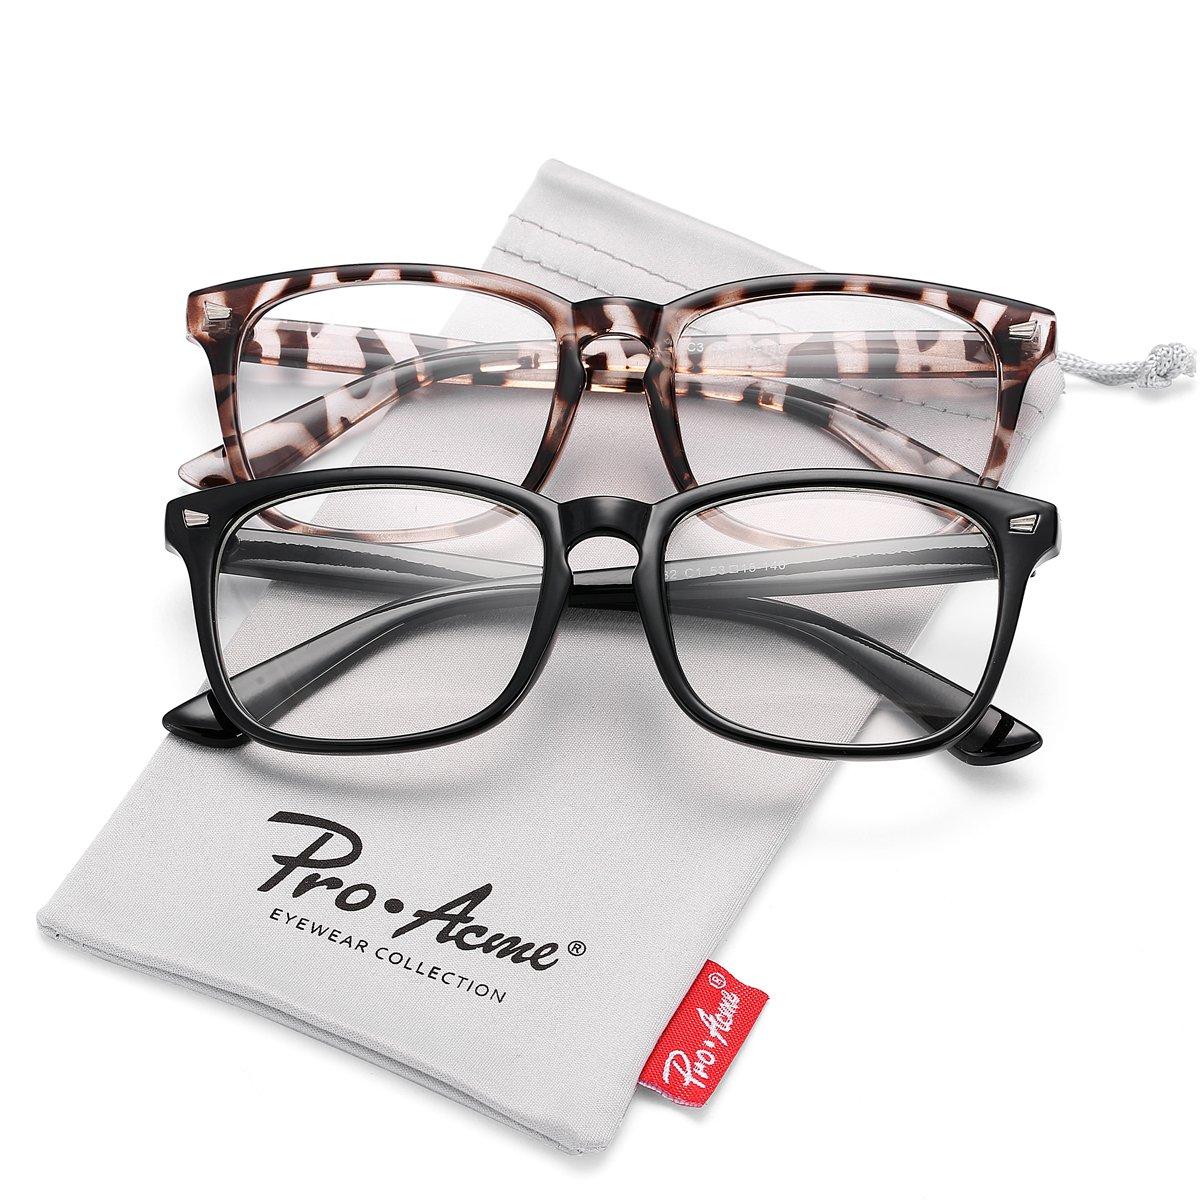 Pro Acme New Wayfarer Non-prescription Glasses Frame Clear Lens Eyeglasses (Black +Leopard)